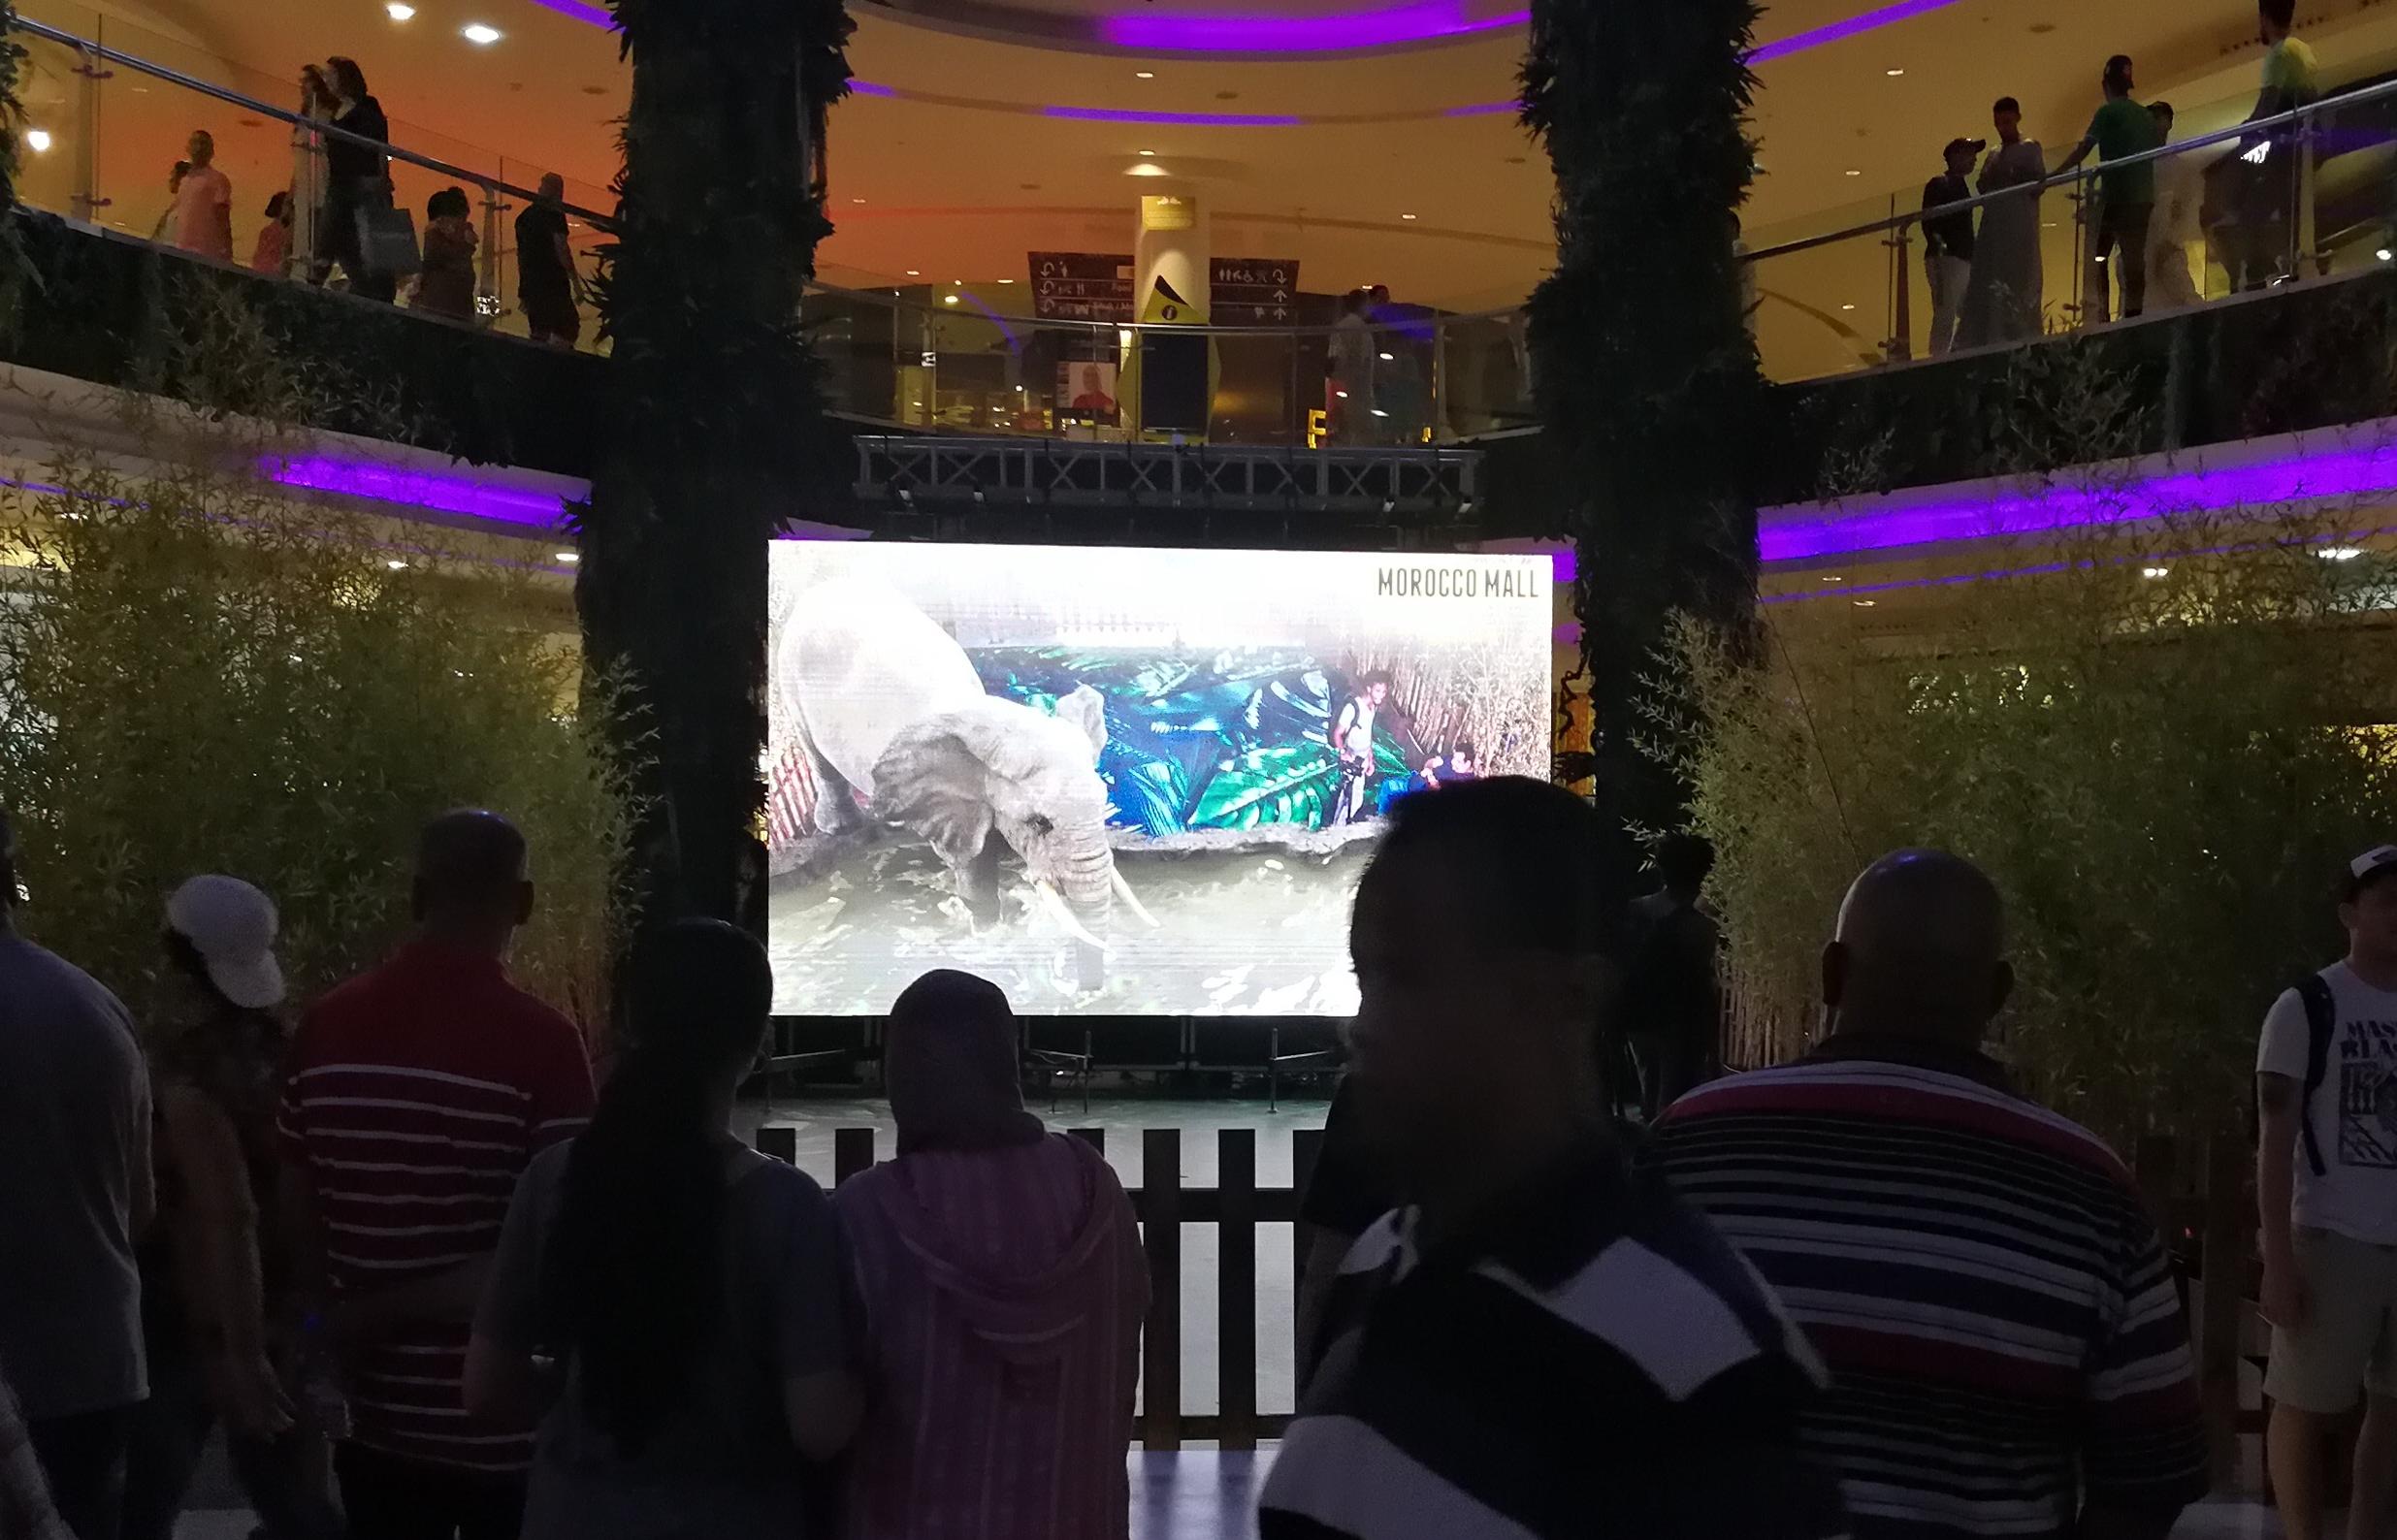 _Morocco Mall2.jpg